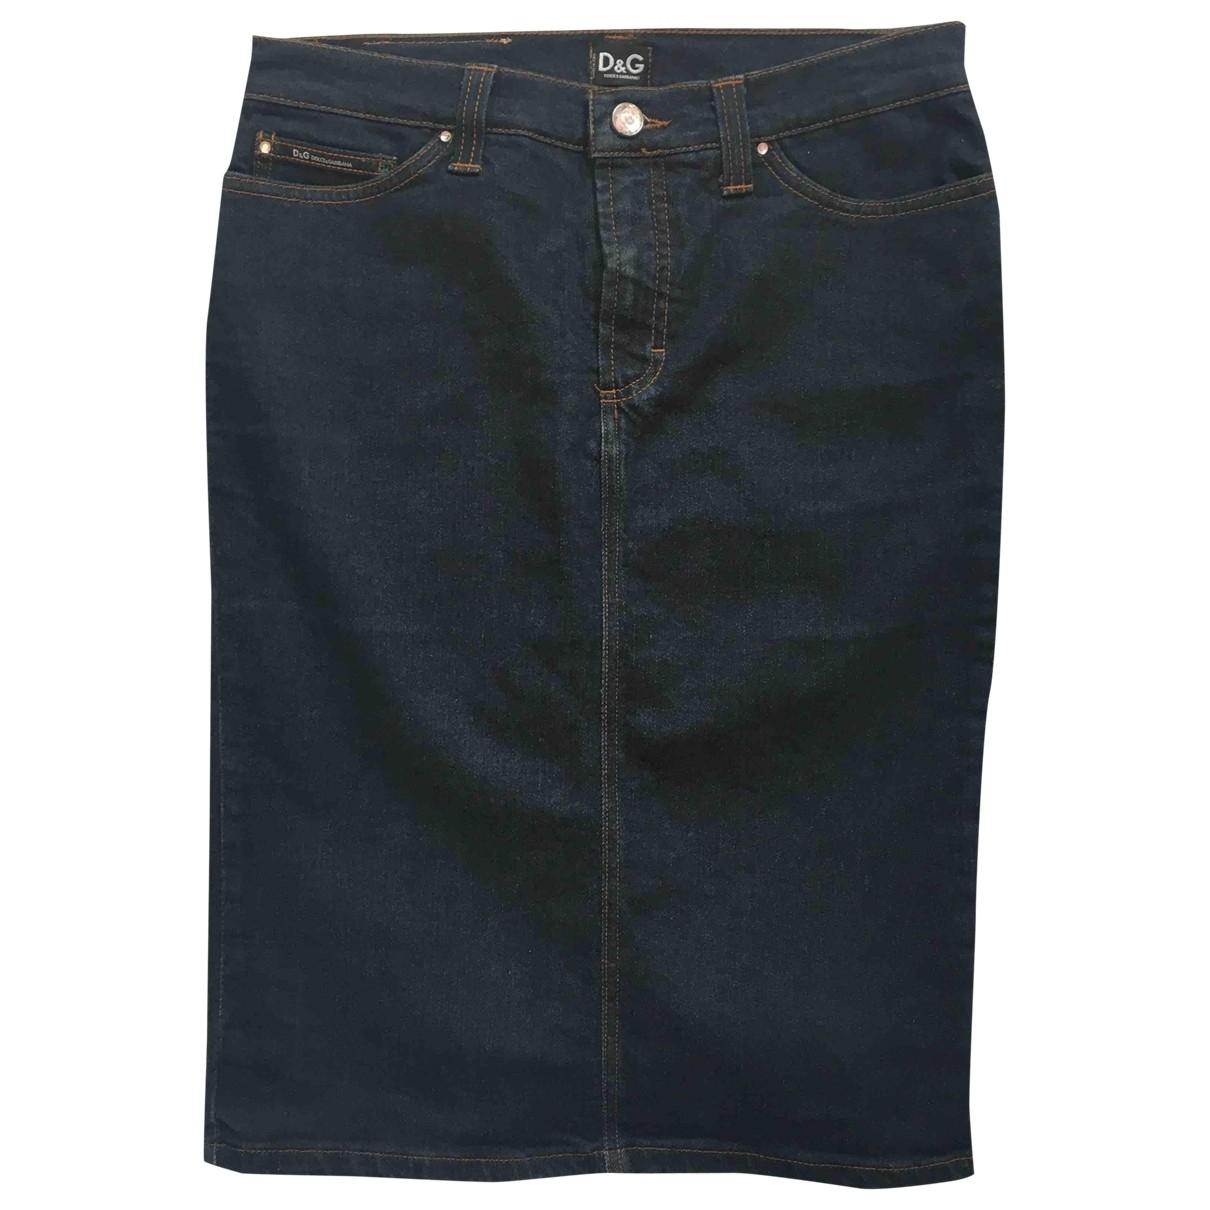 D&g \N Rocke in  Blau Denim - Jeans